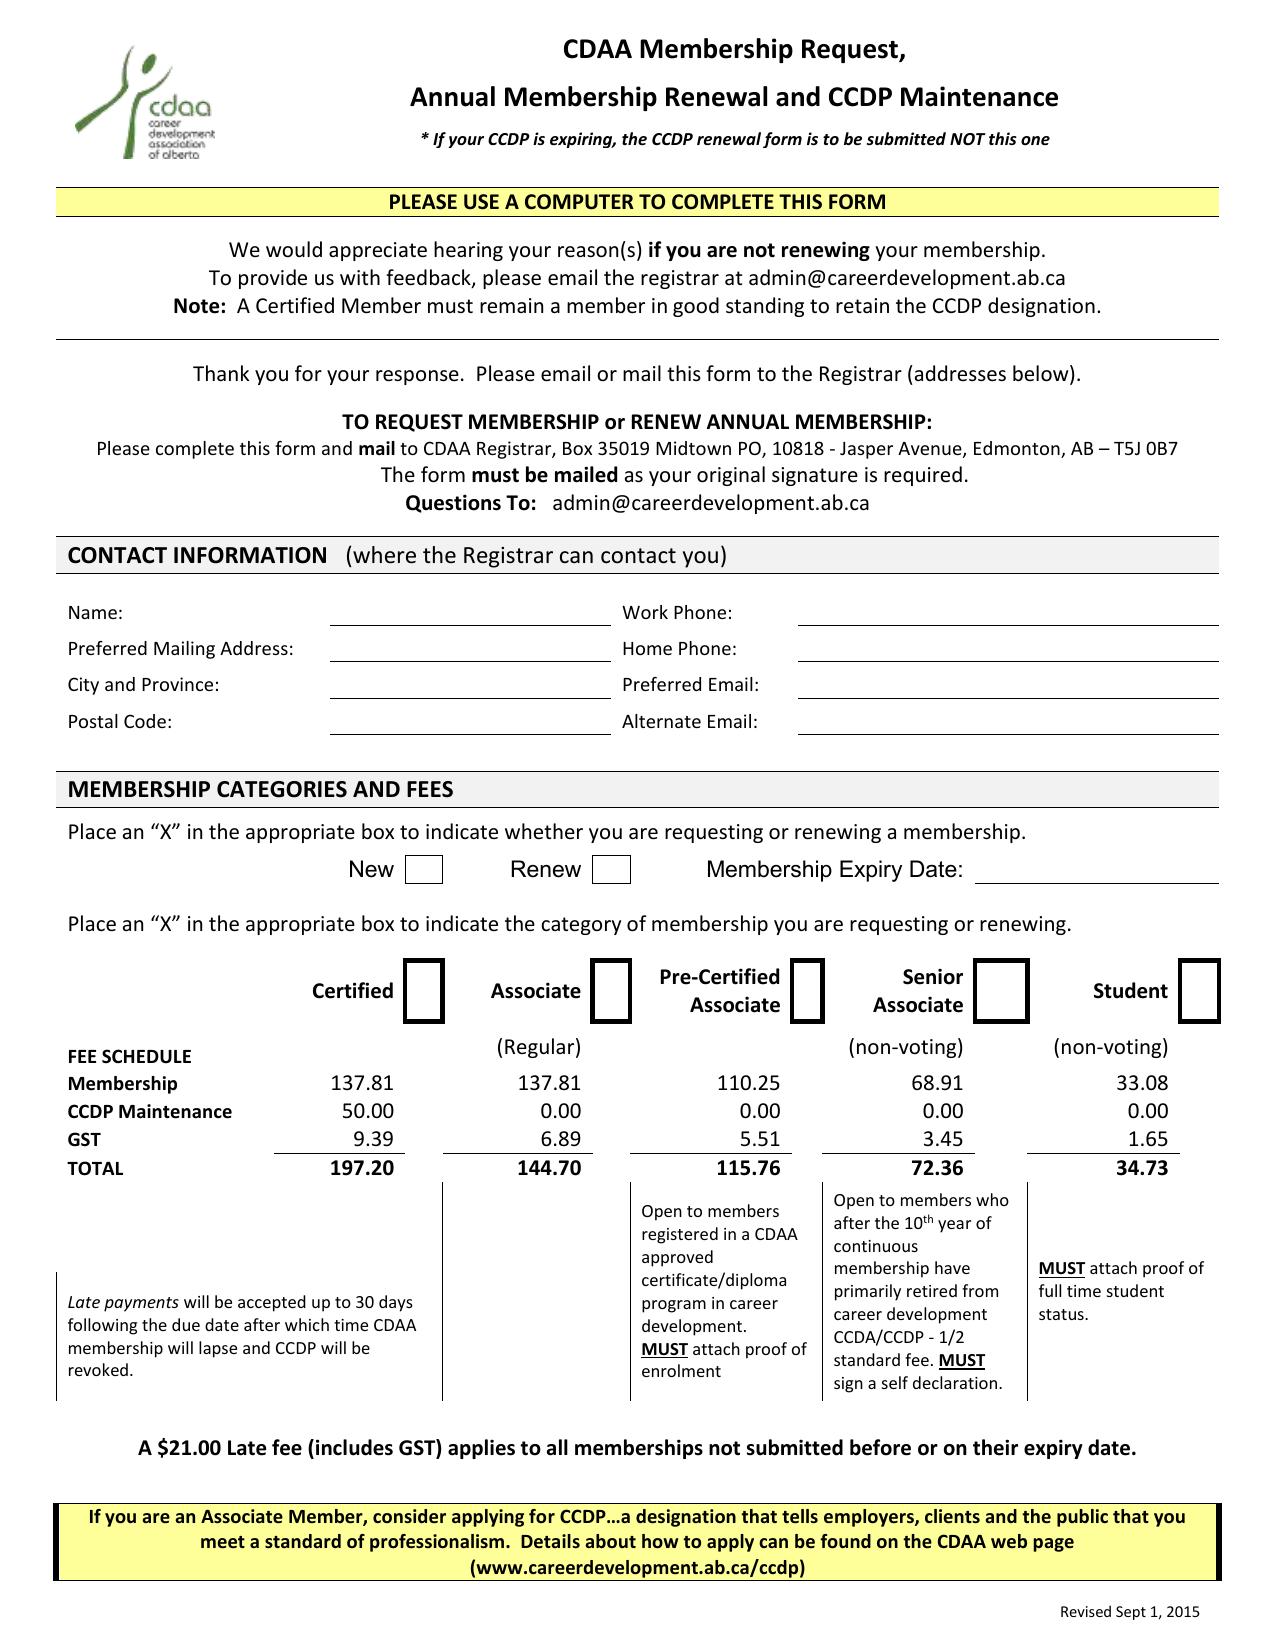 CDAA Membership application form